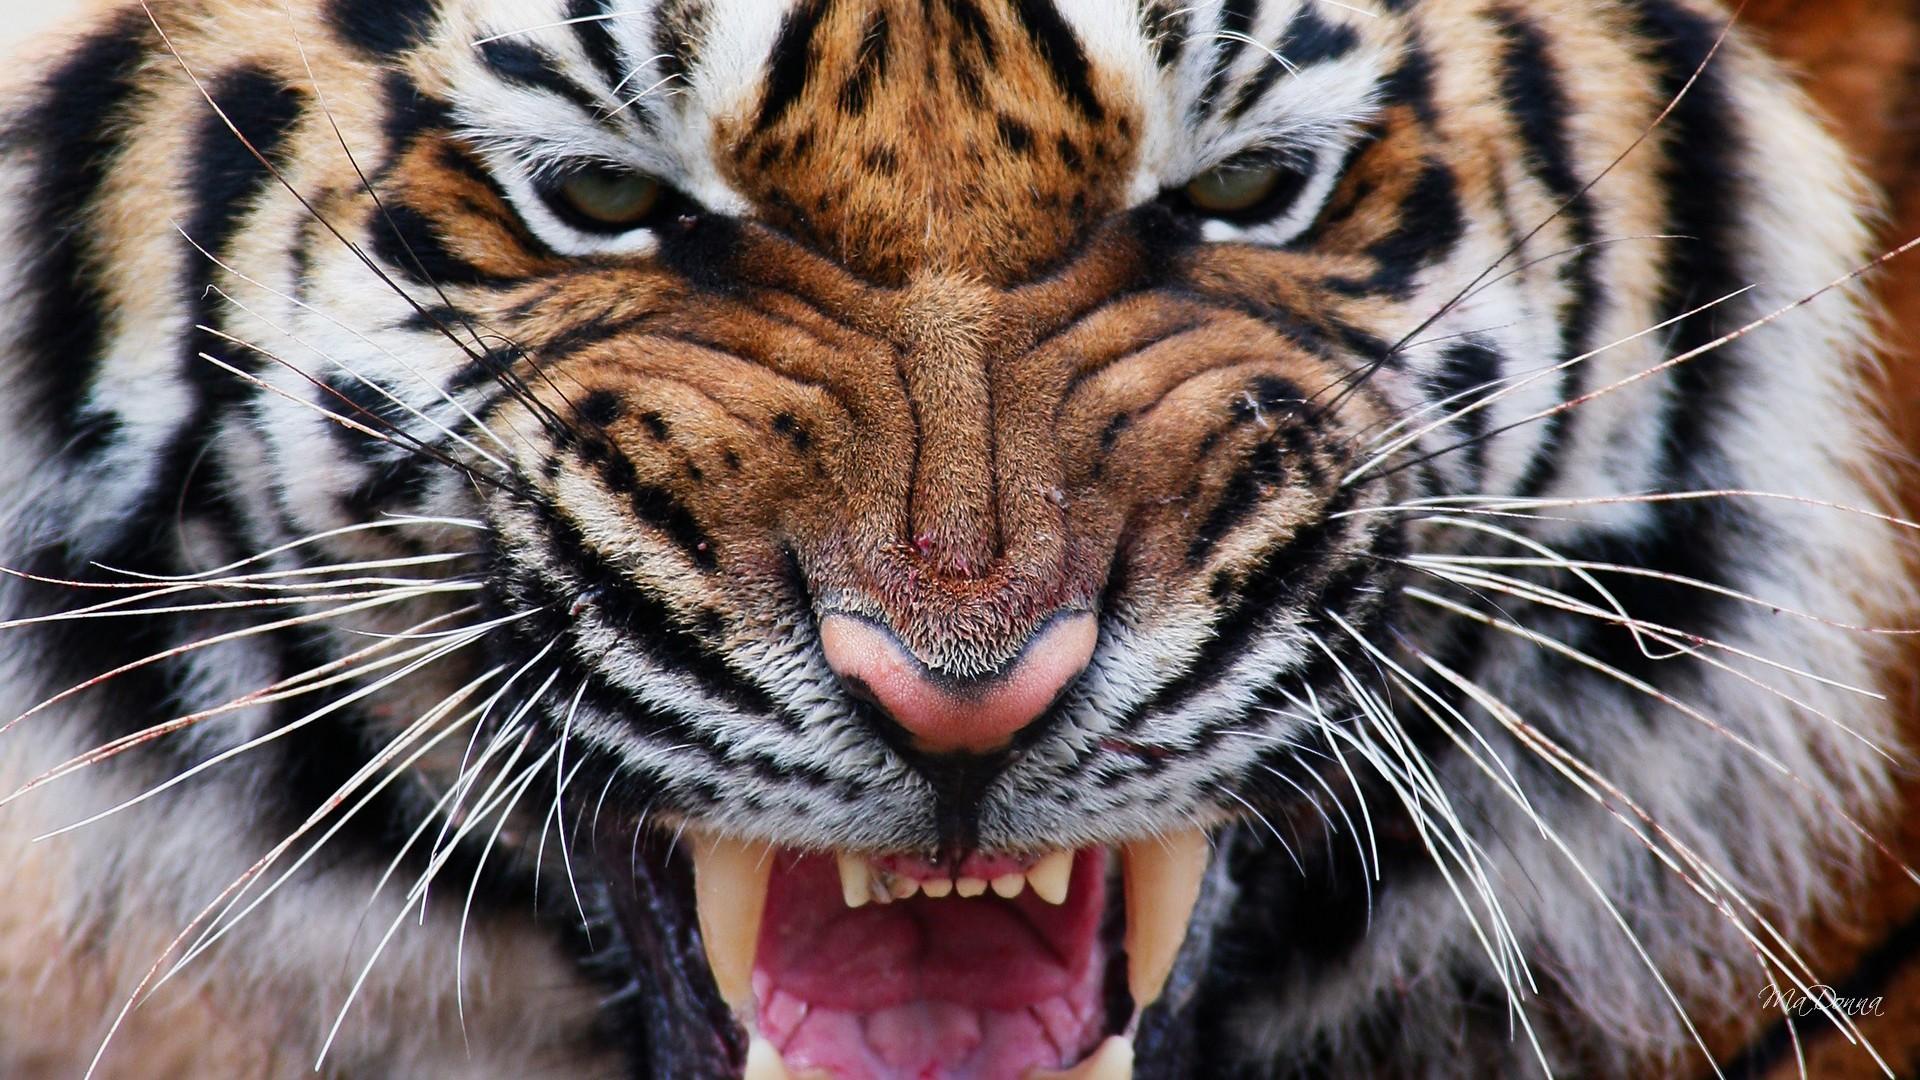 Tiger Eye Wallpaper